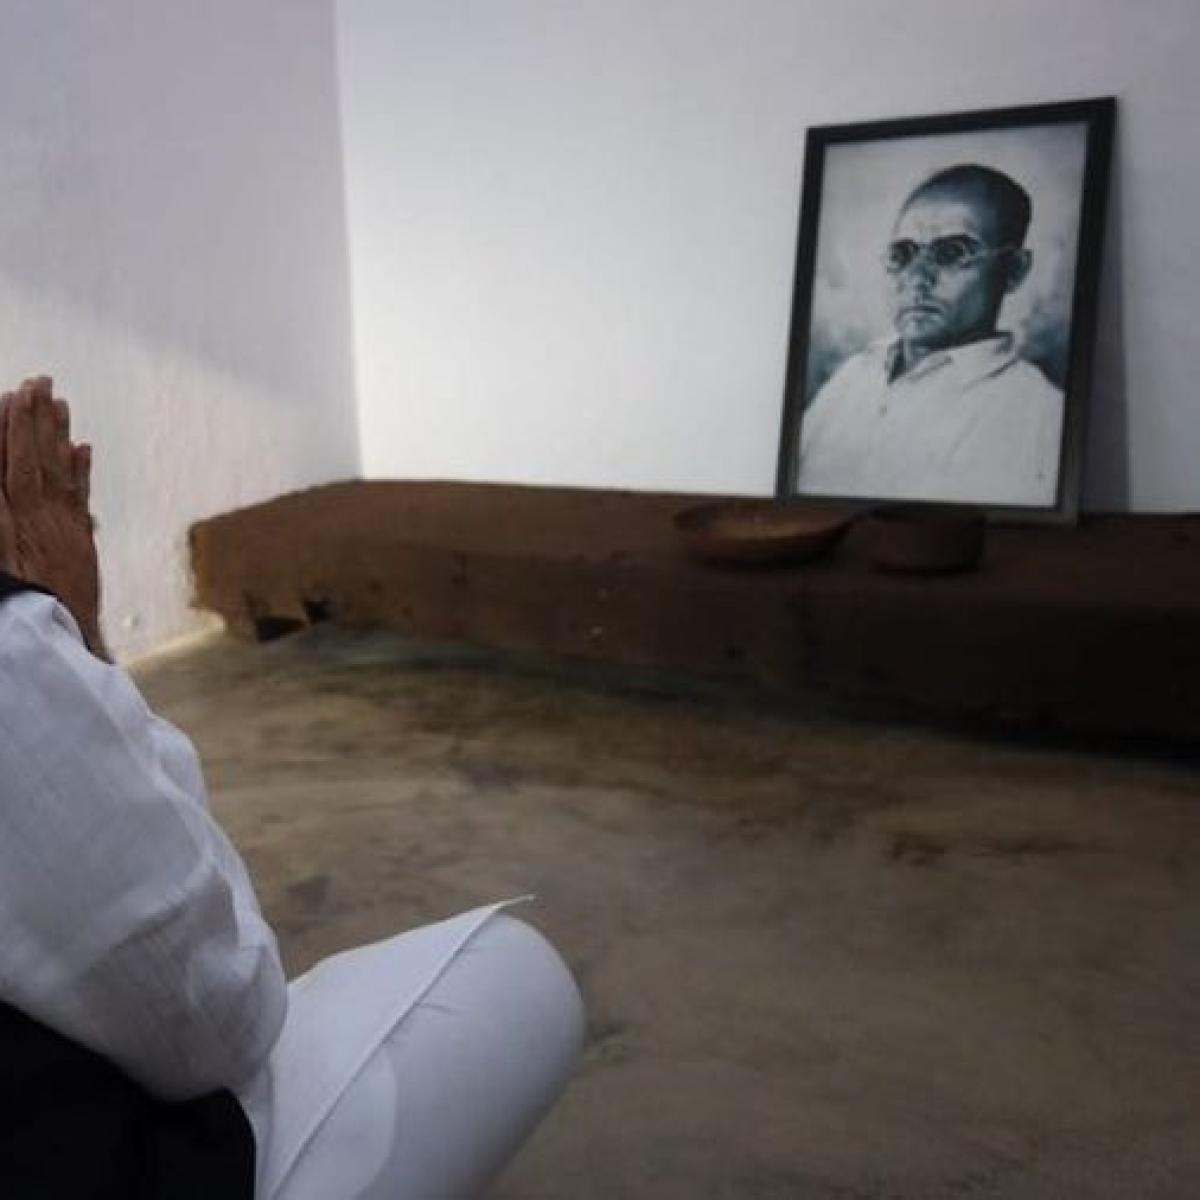 Savarkar saga, symptom of deification syndrome